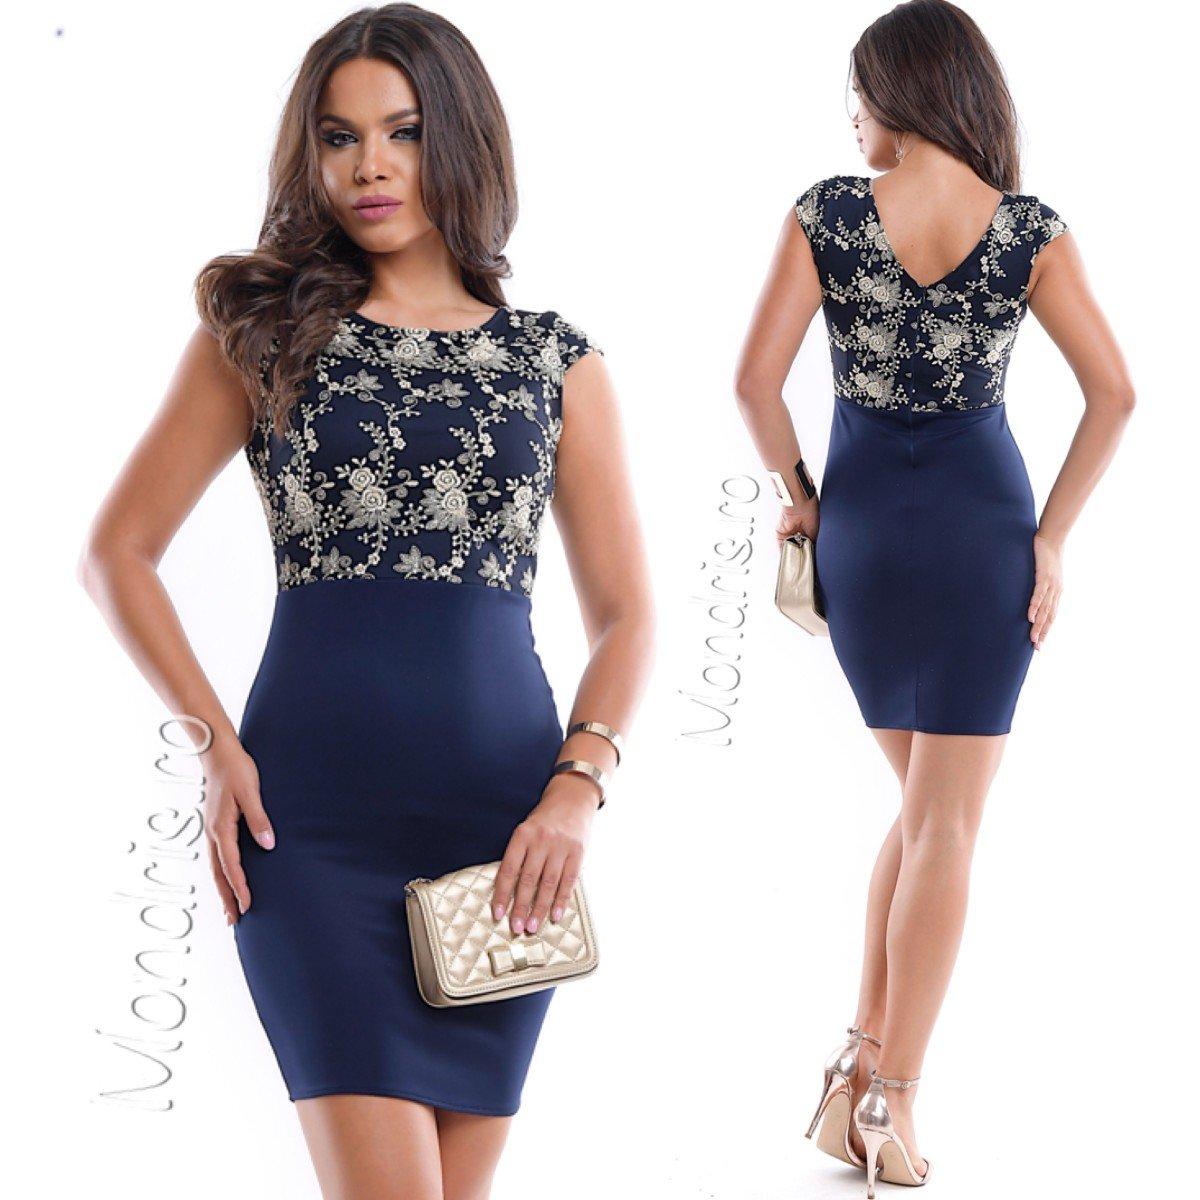 Rochie de ocazie scurta stramta bleumarin cu corset dantelat